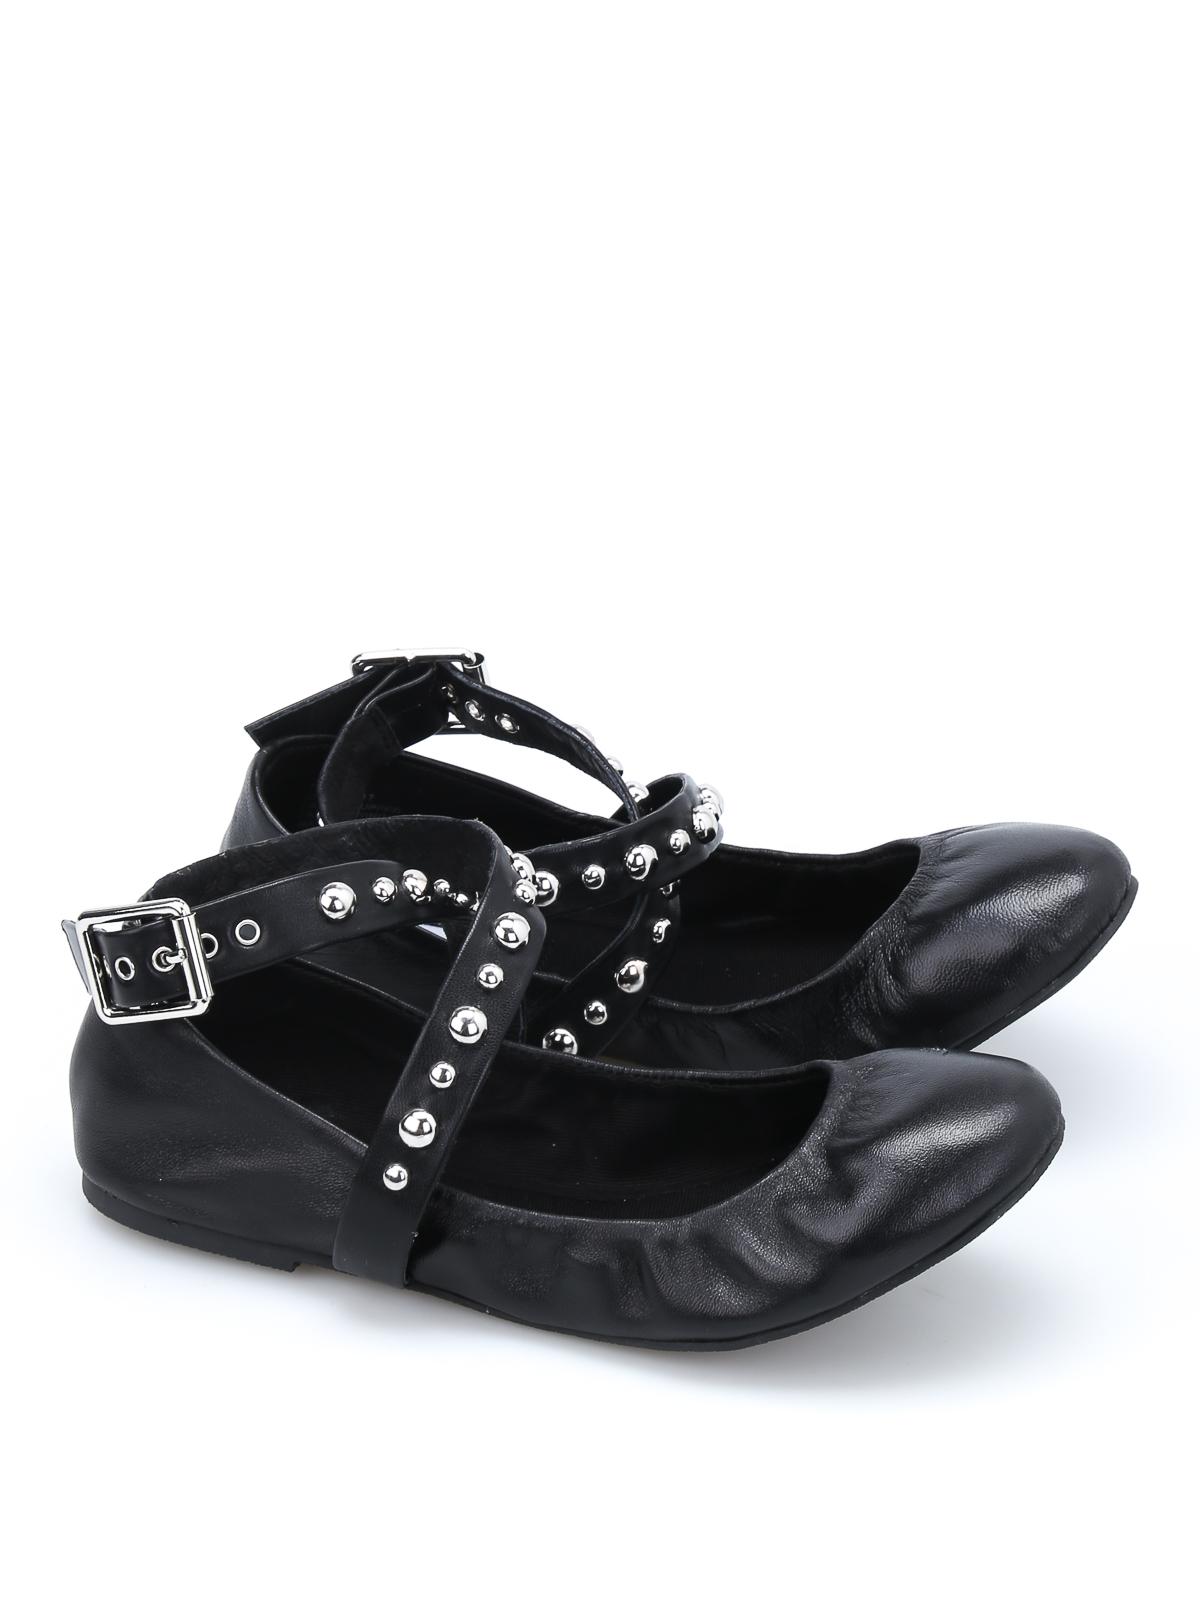 codice promozionale 305b1 51736 Steve Madden - Mollie flats - flat shoes - MOLLIELEATHER ...